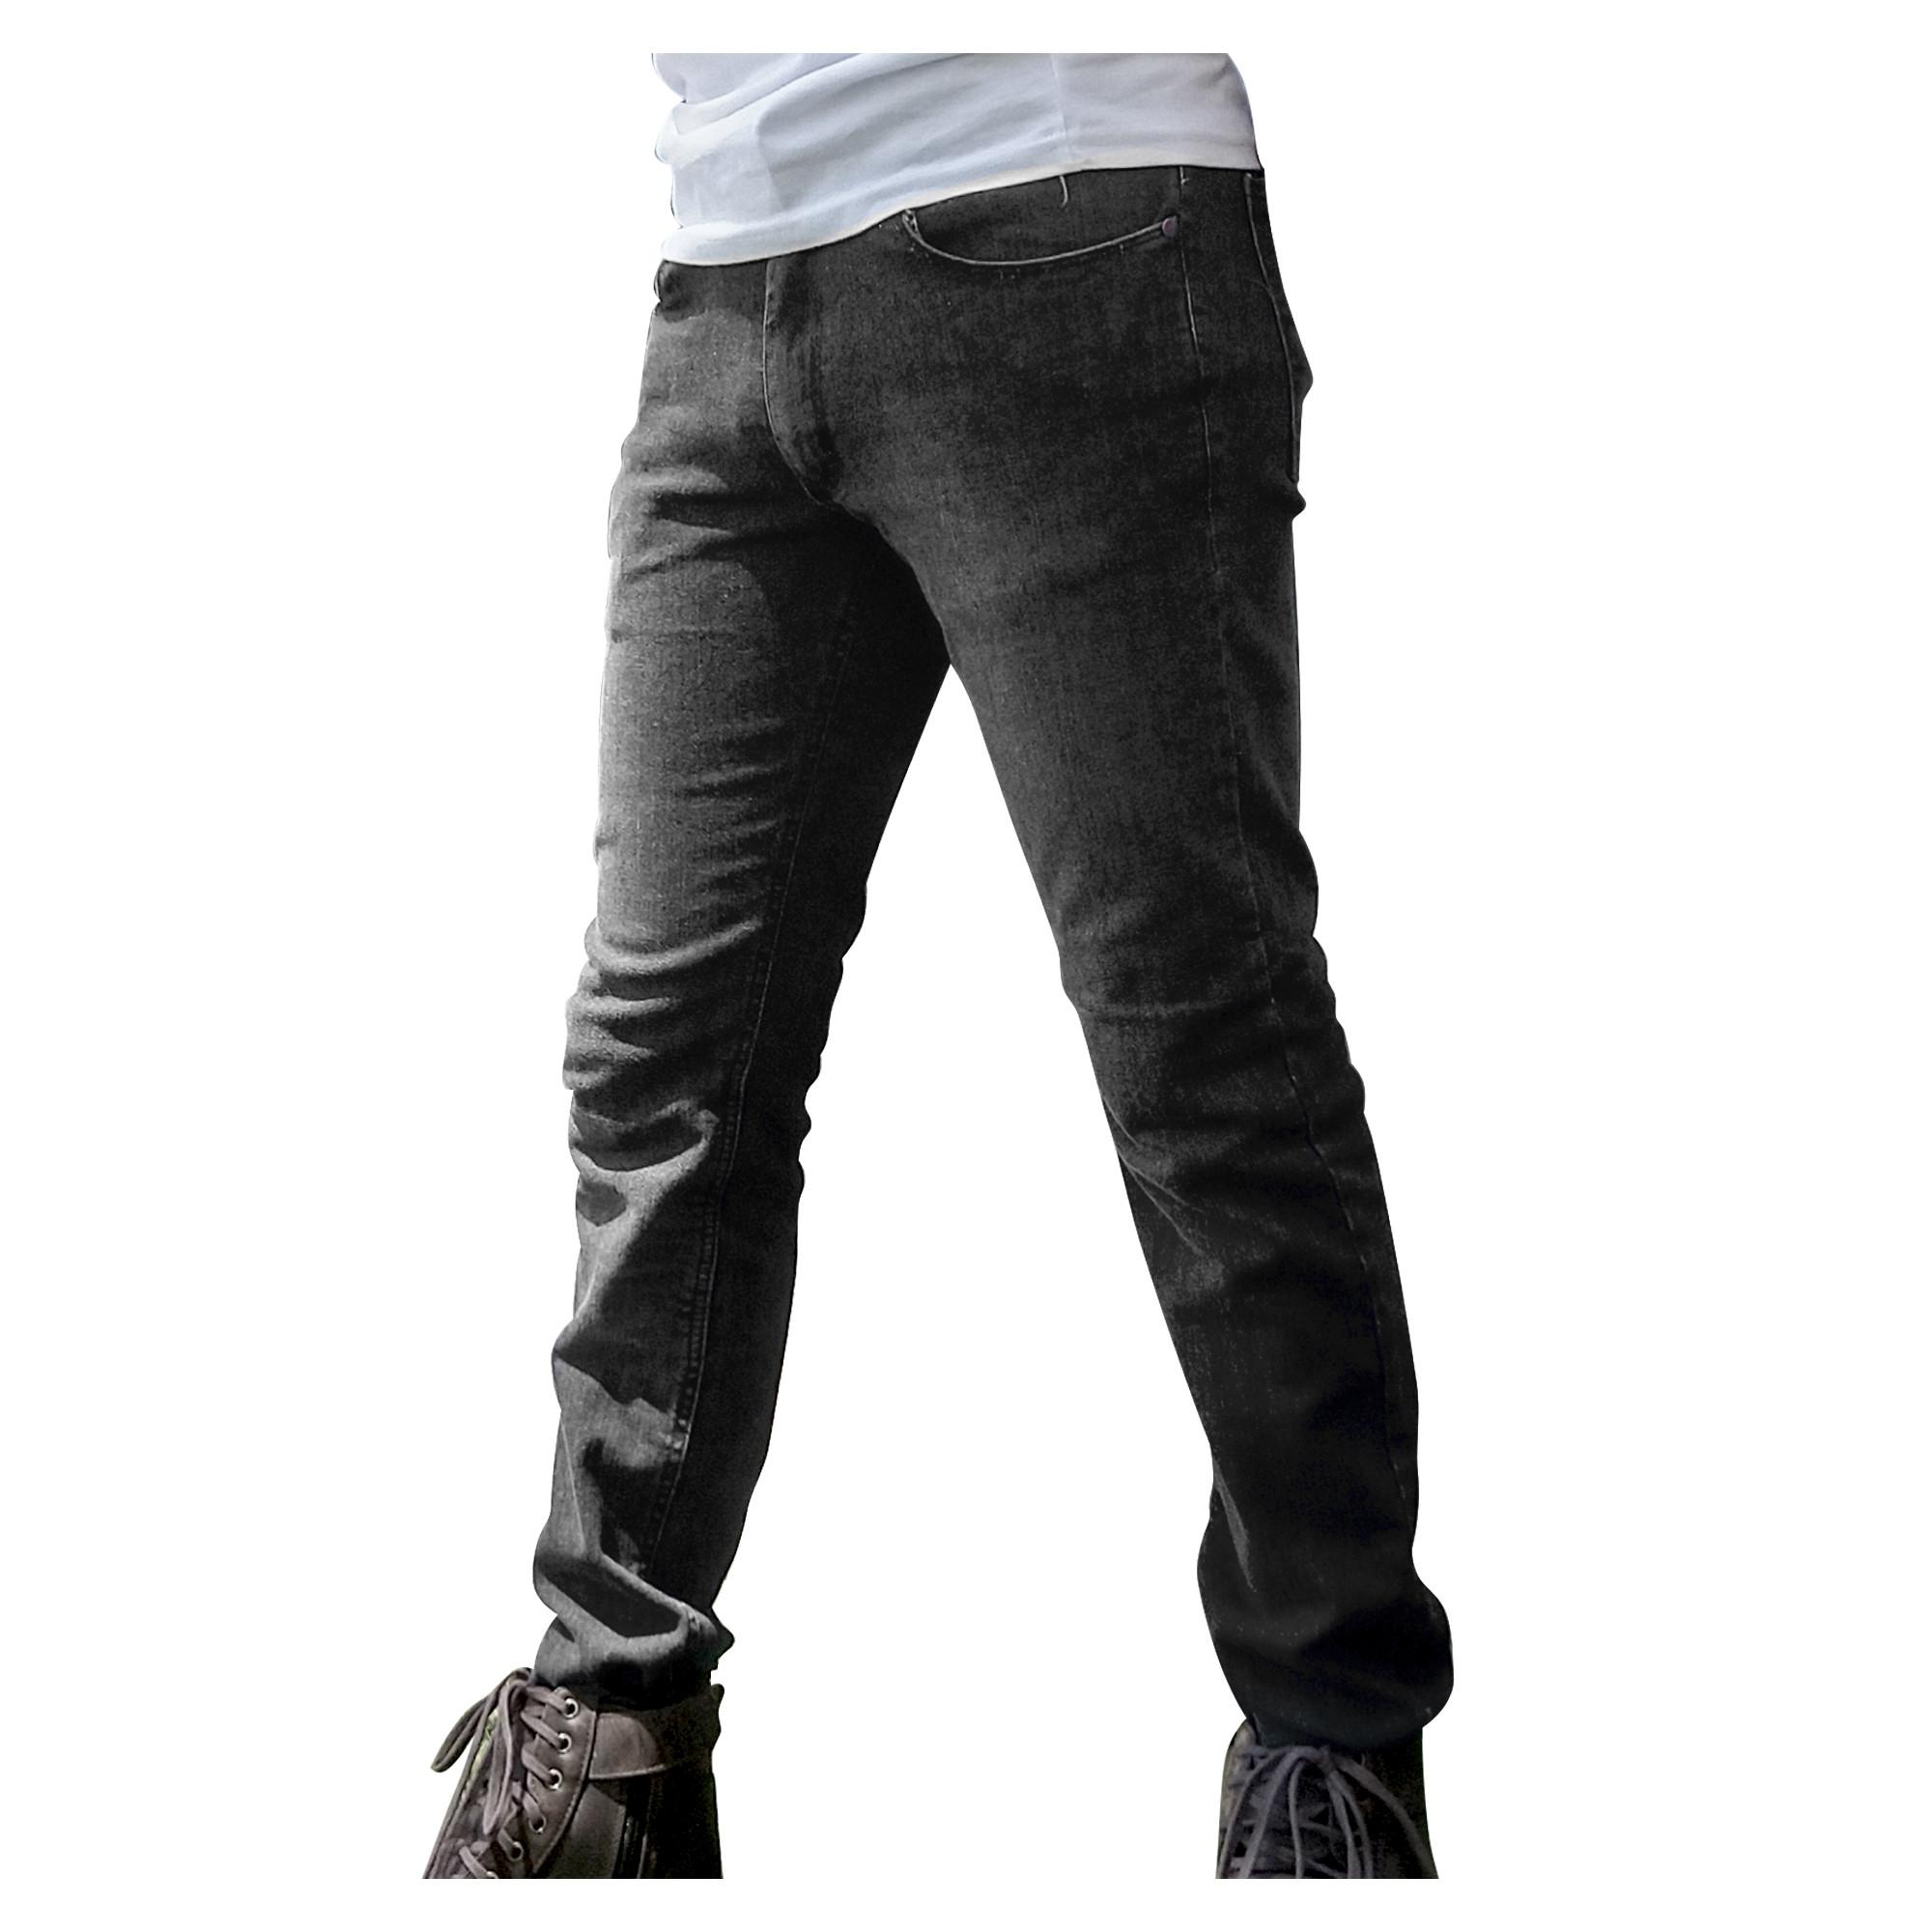 JeanS Hombre Kevlar Protecciones Rodilla Samurai Warrior